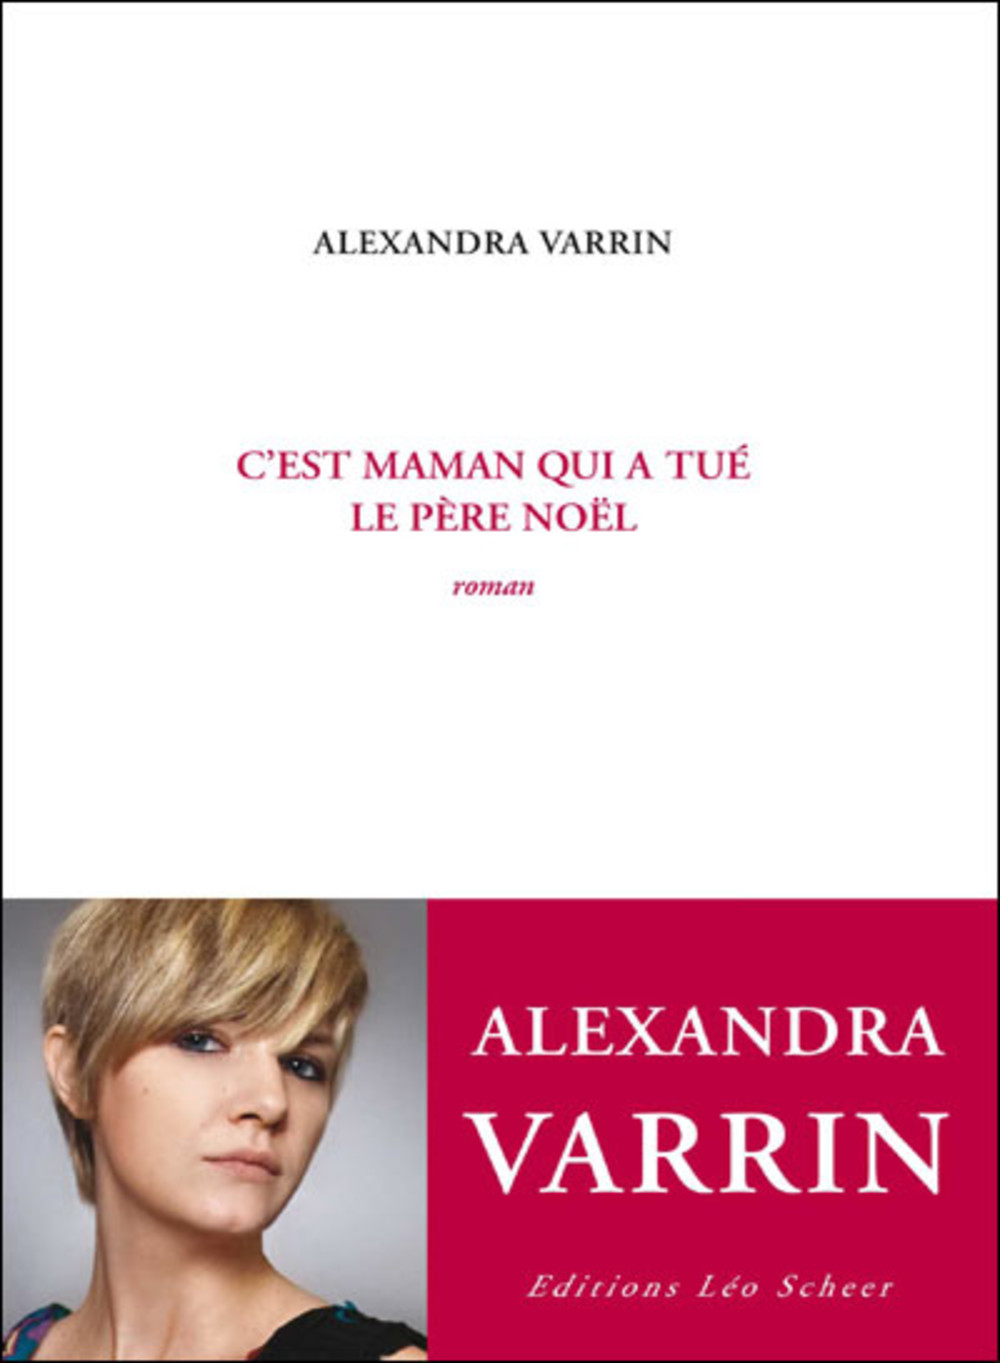 C_est_maman_qui_a_tue_le_Pere_Noel.jpg